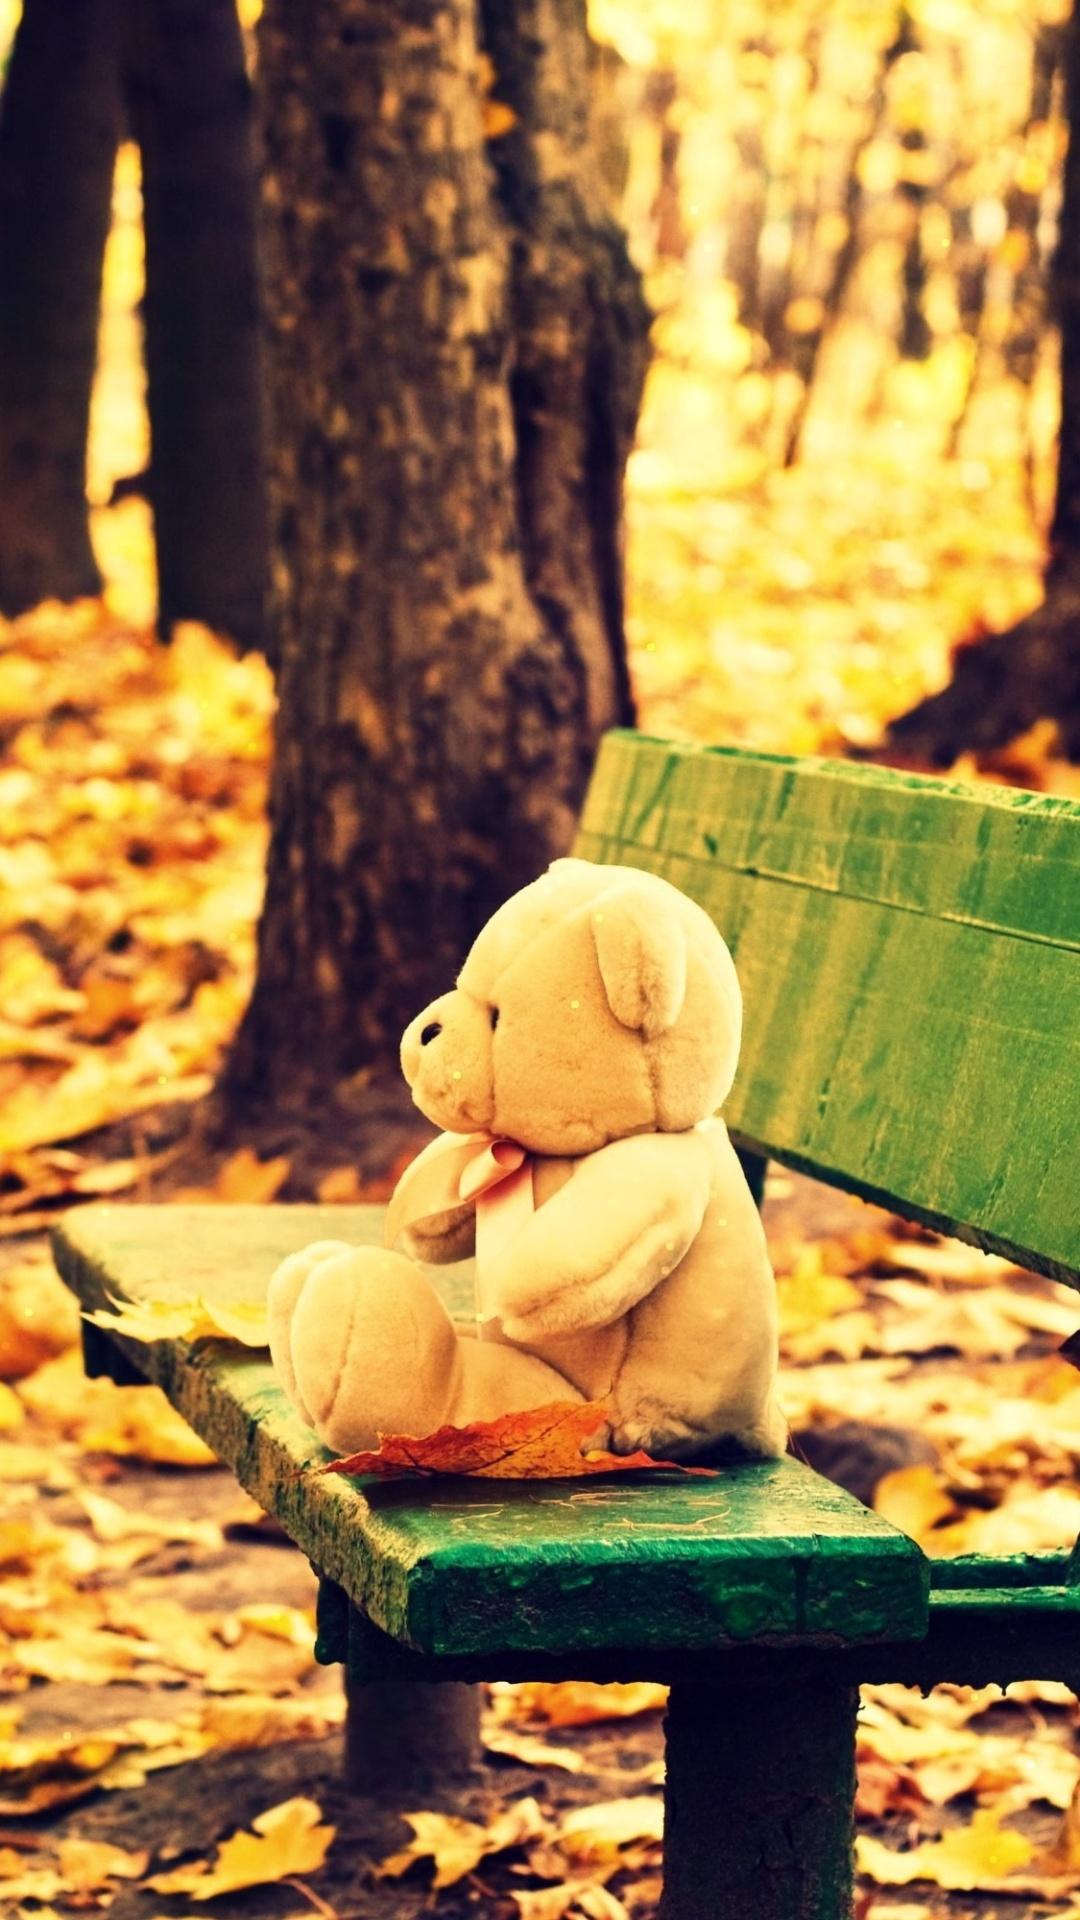 Sad Alone Teddy Bear Wallpapers 1080x1920 558825